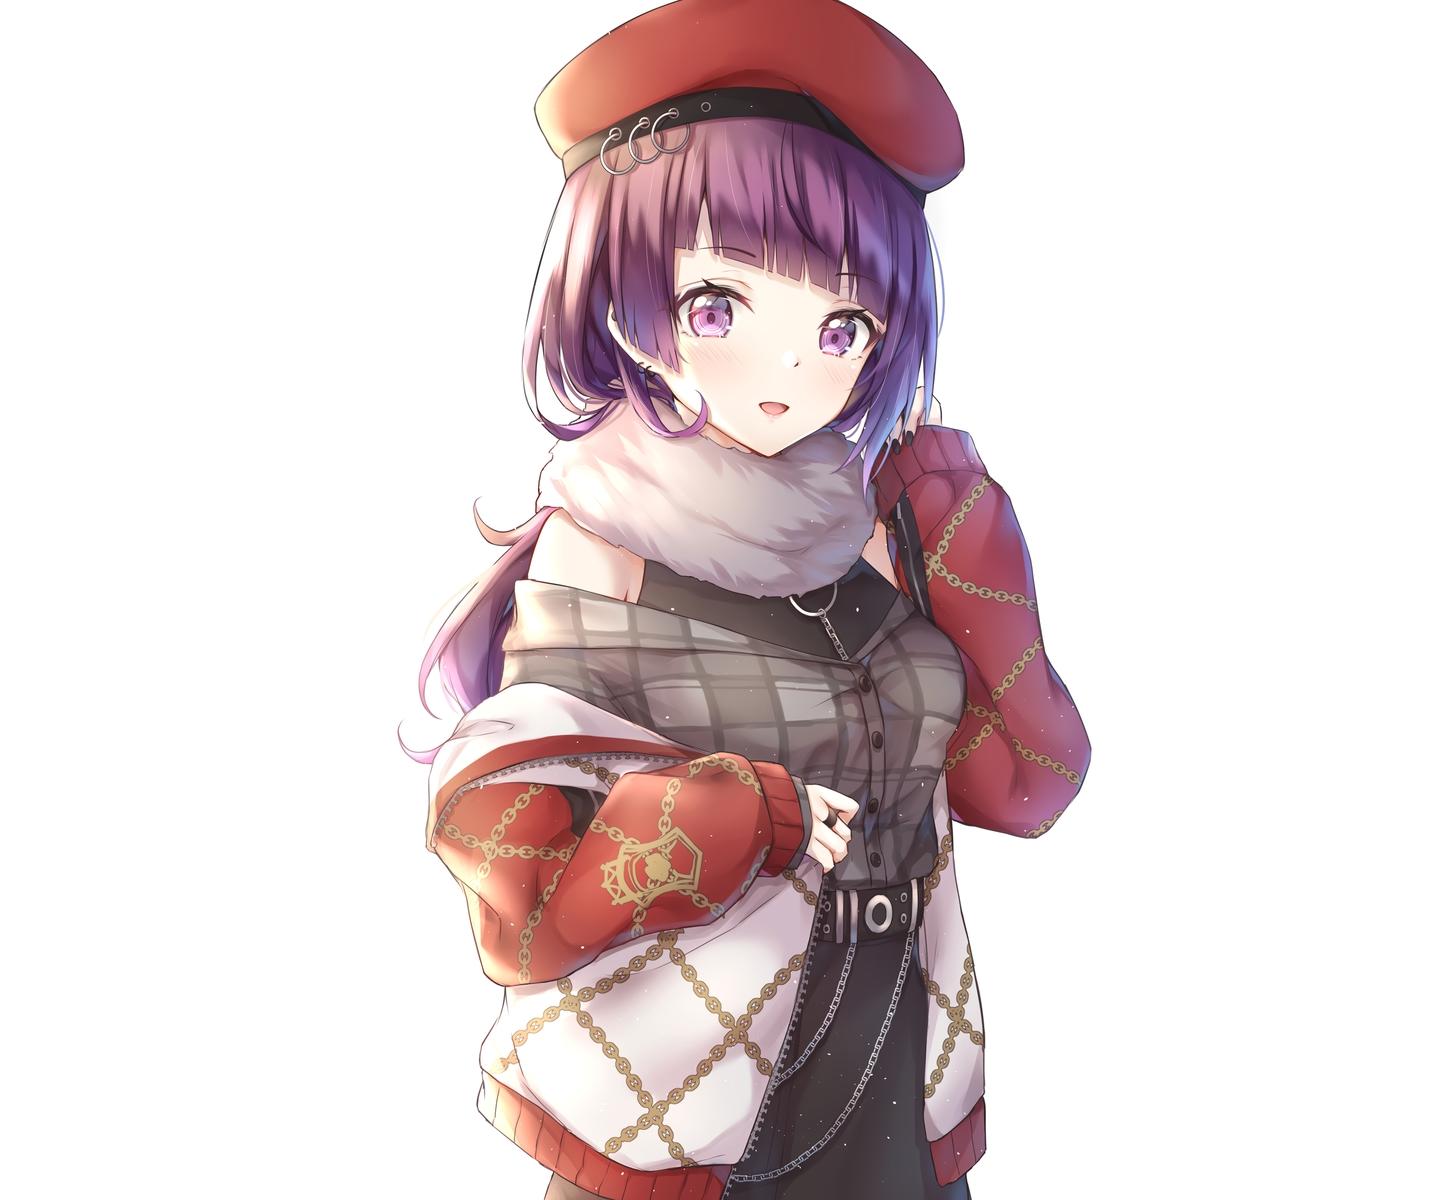 cuna_(qunya) garter_belt hat idolmaster idolmaster_shiny_colors long_hair purple_eyes purple_hair tanaka_mamimi third-party_edit white